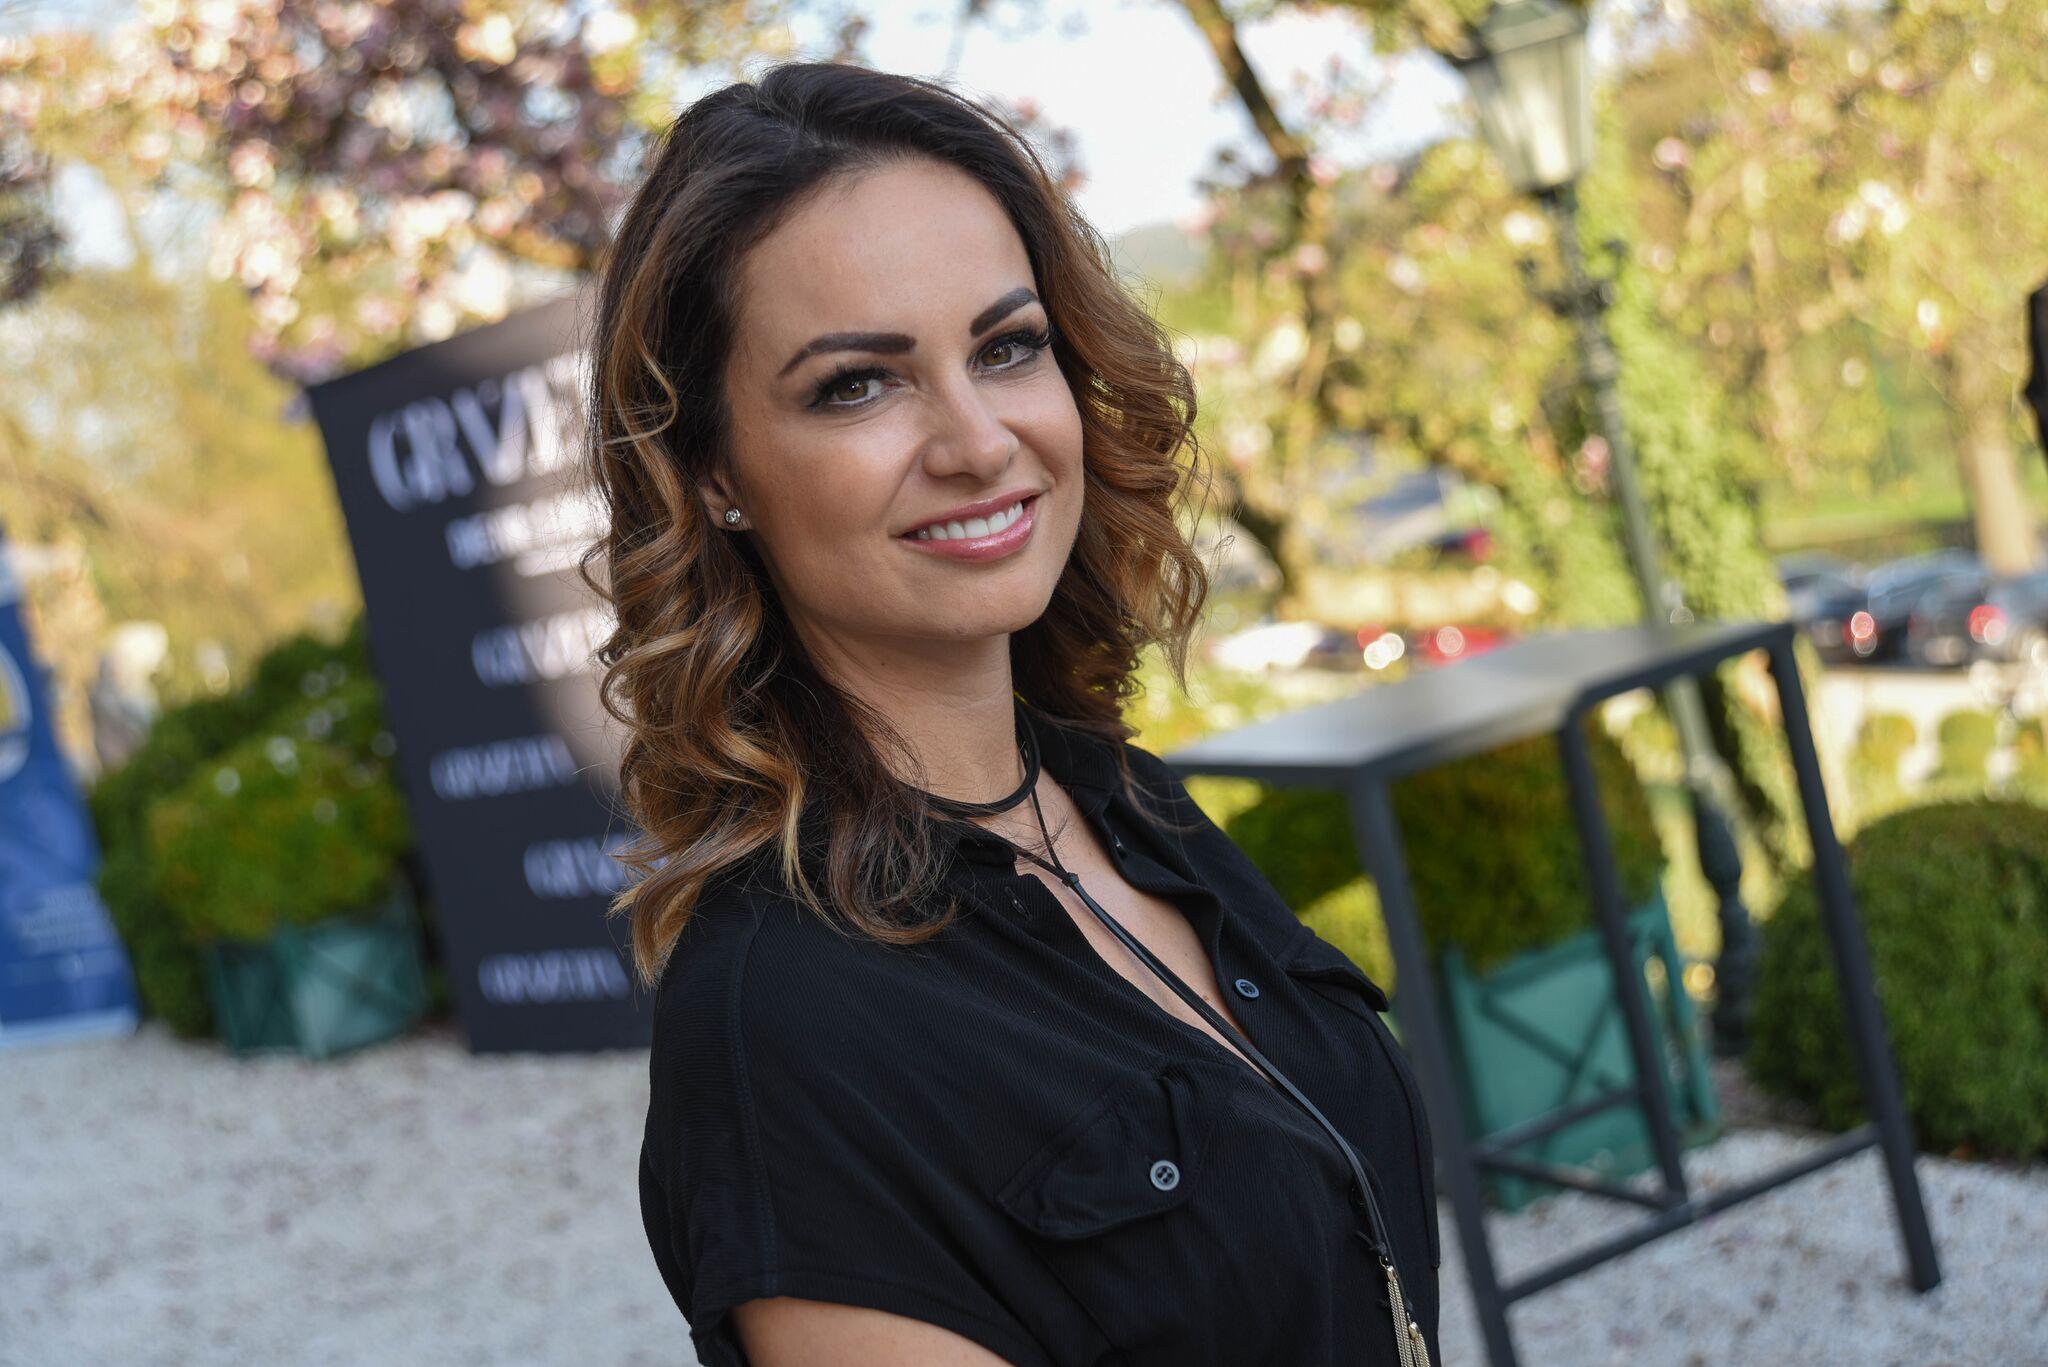 Silvia Schachermayer